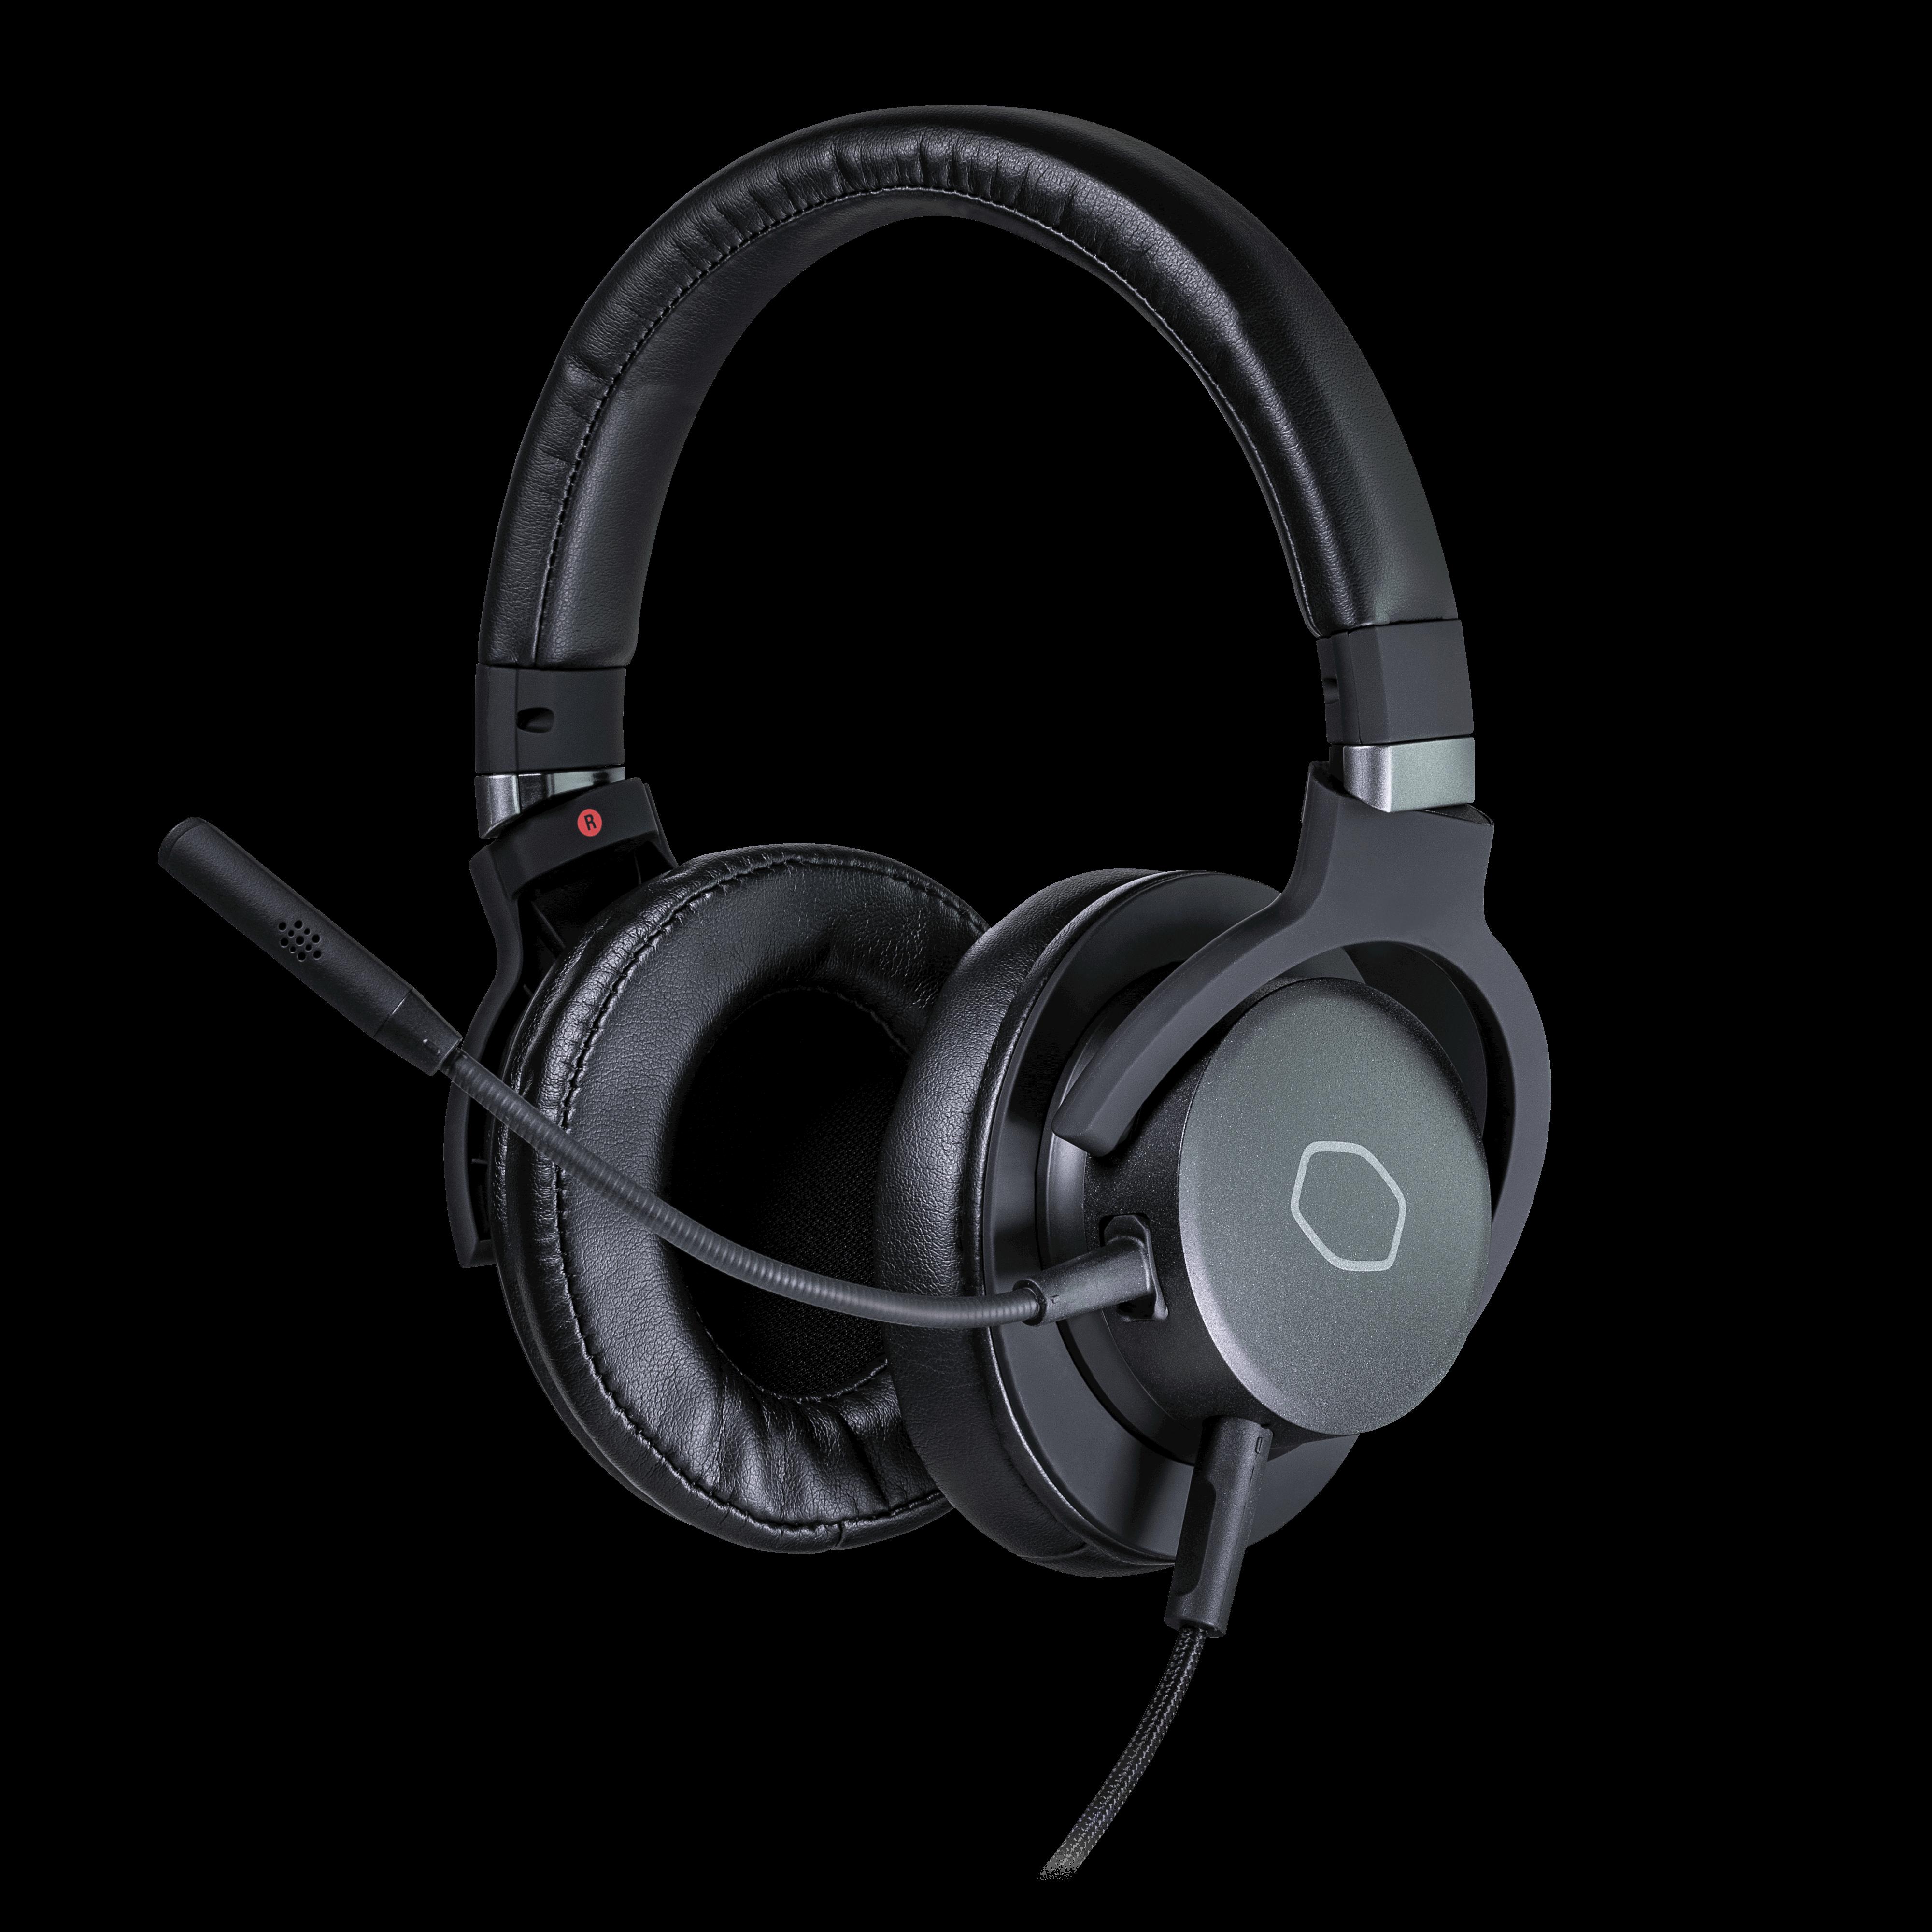 Cooler Master MH752 Gaming Headphones